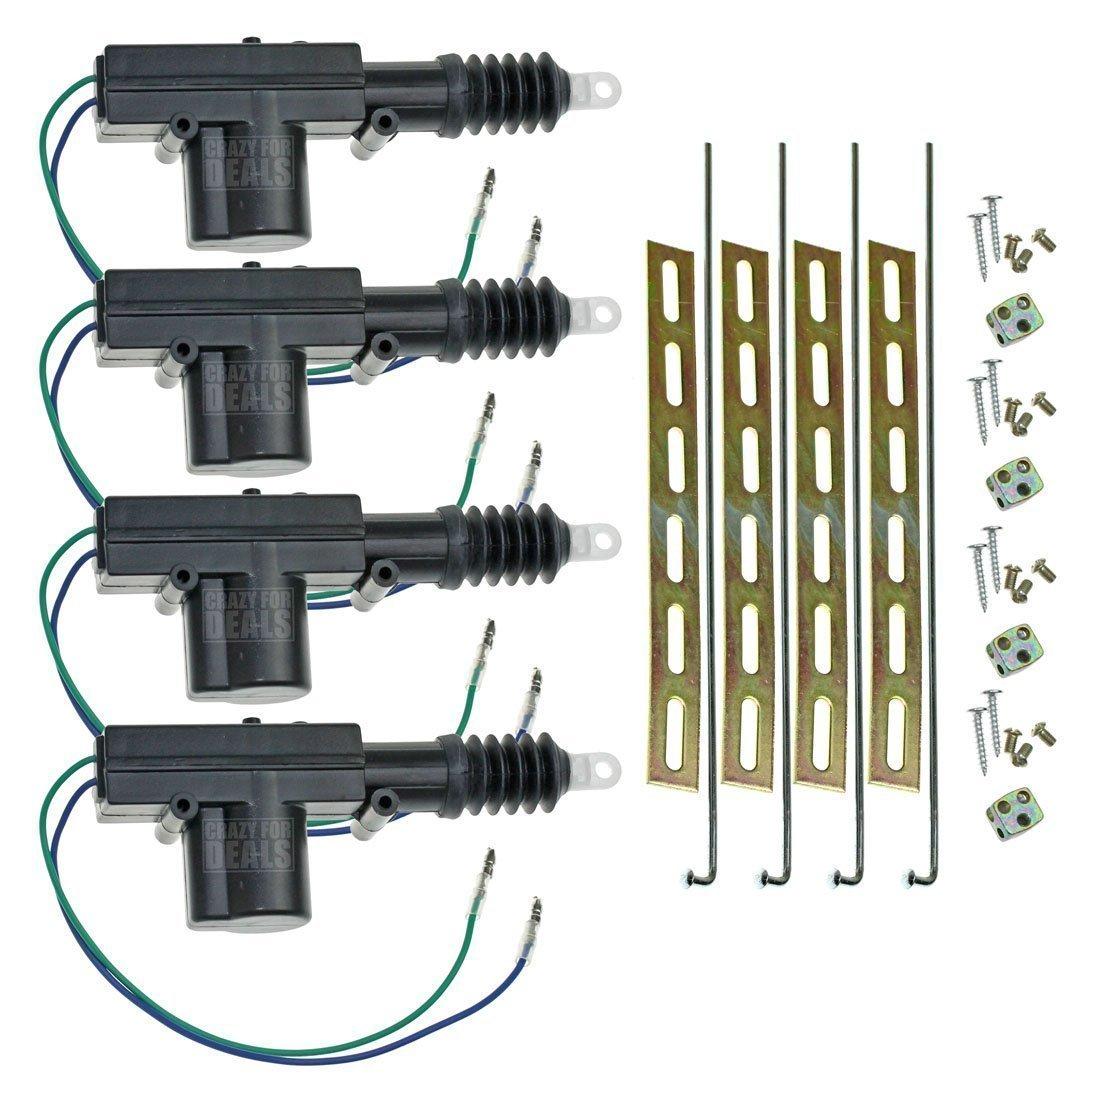 Installgear Universal Car Power Door Lock Actuator 12 451m Relay Wiring Diagram 5 Wire Volt Motor 4 Pack Automotive